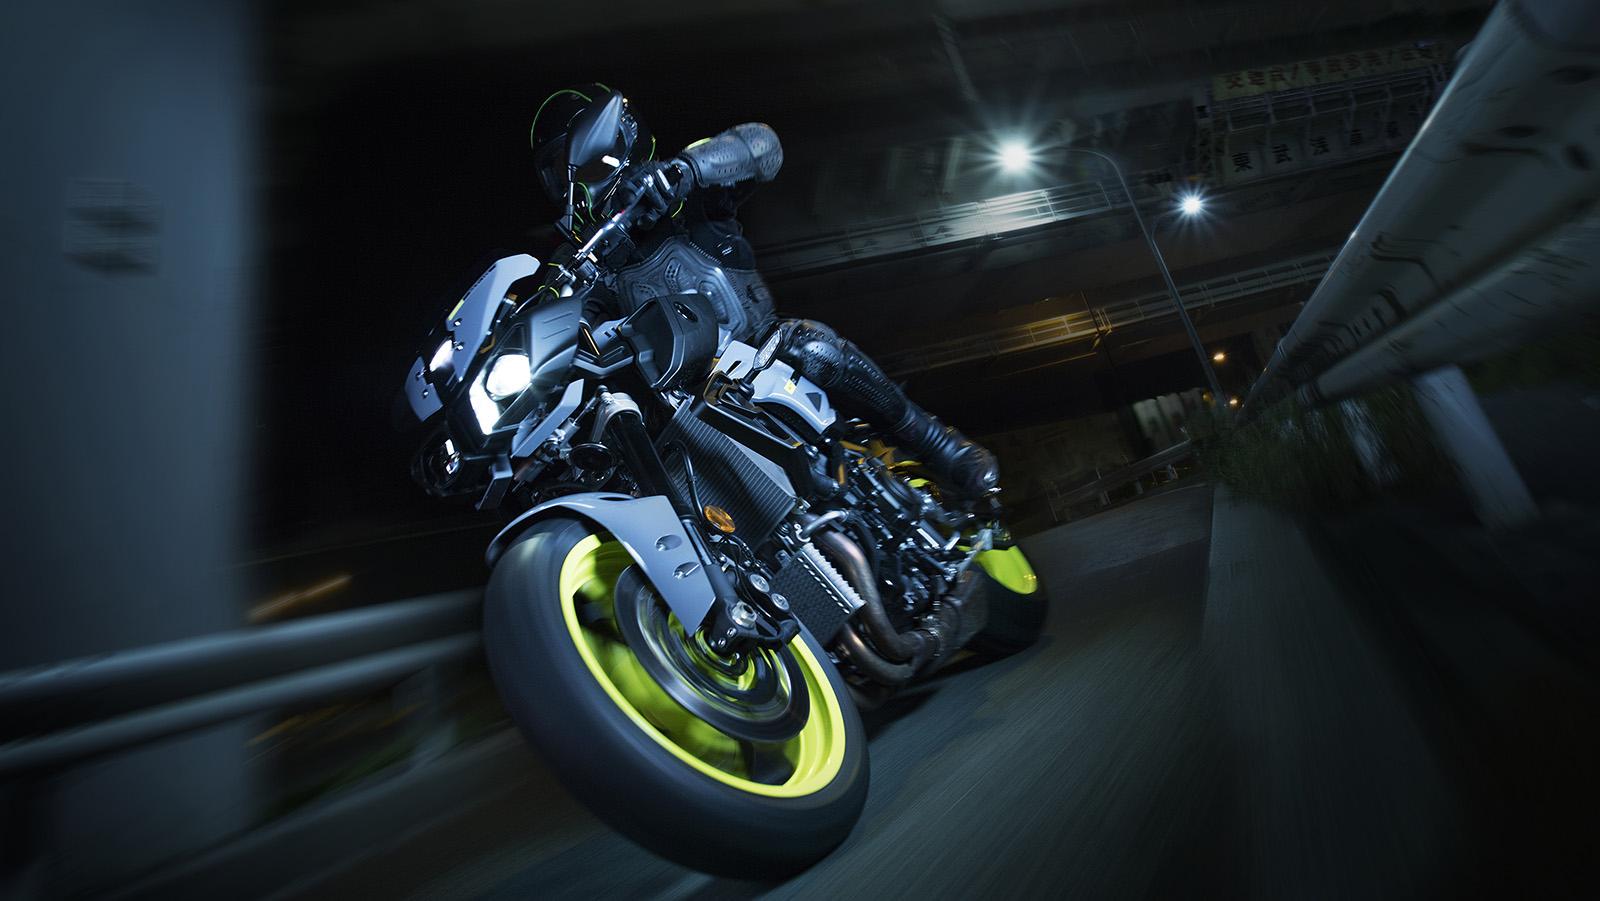 Yamaha MT-10 | MotorCentrumWest